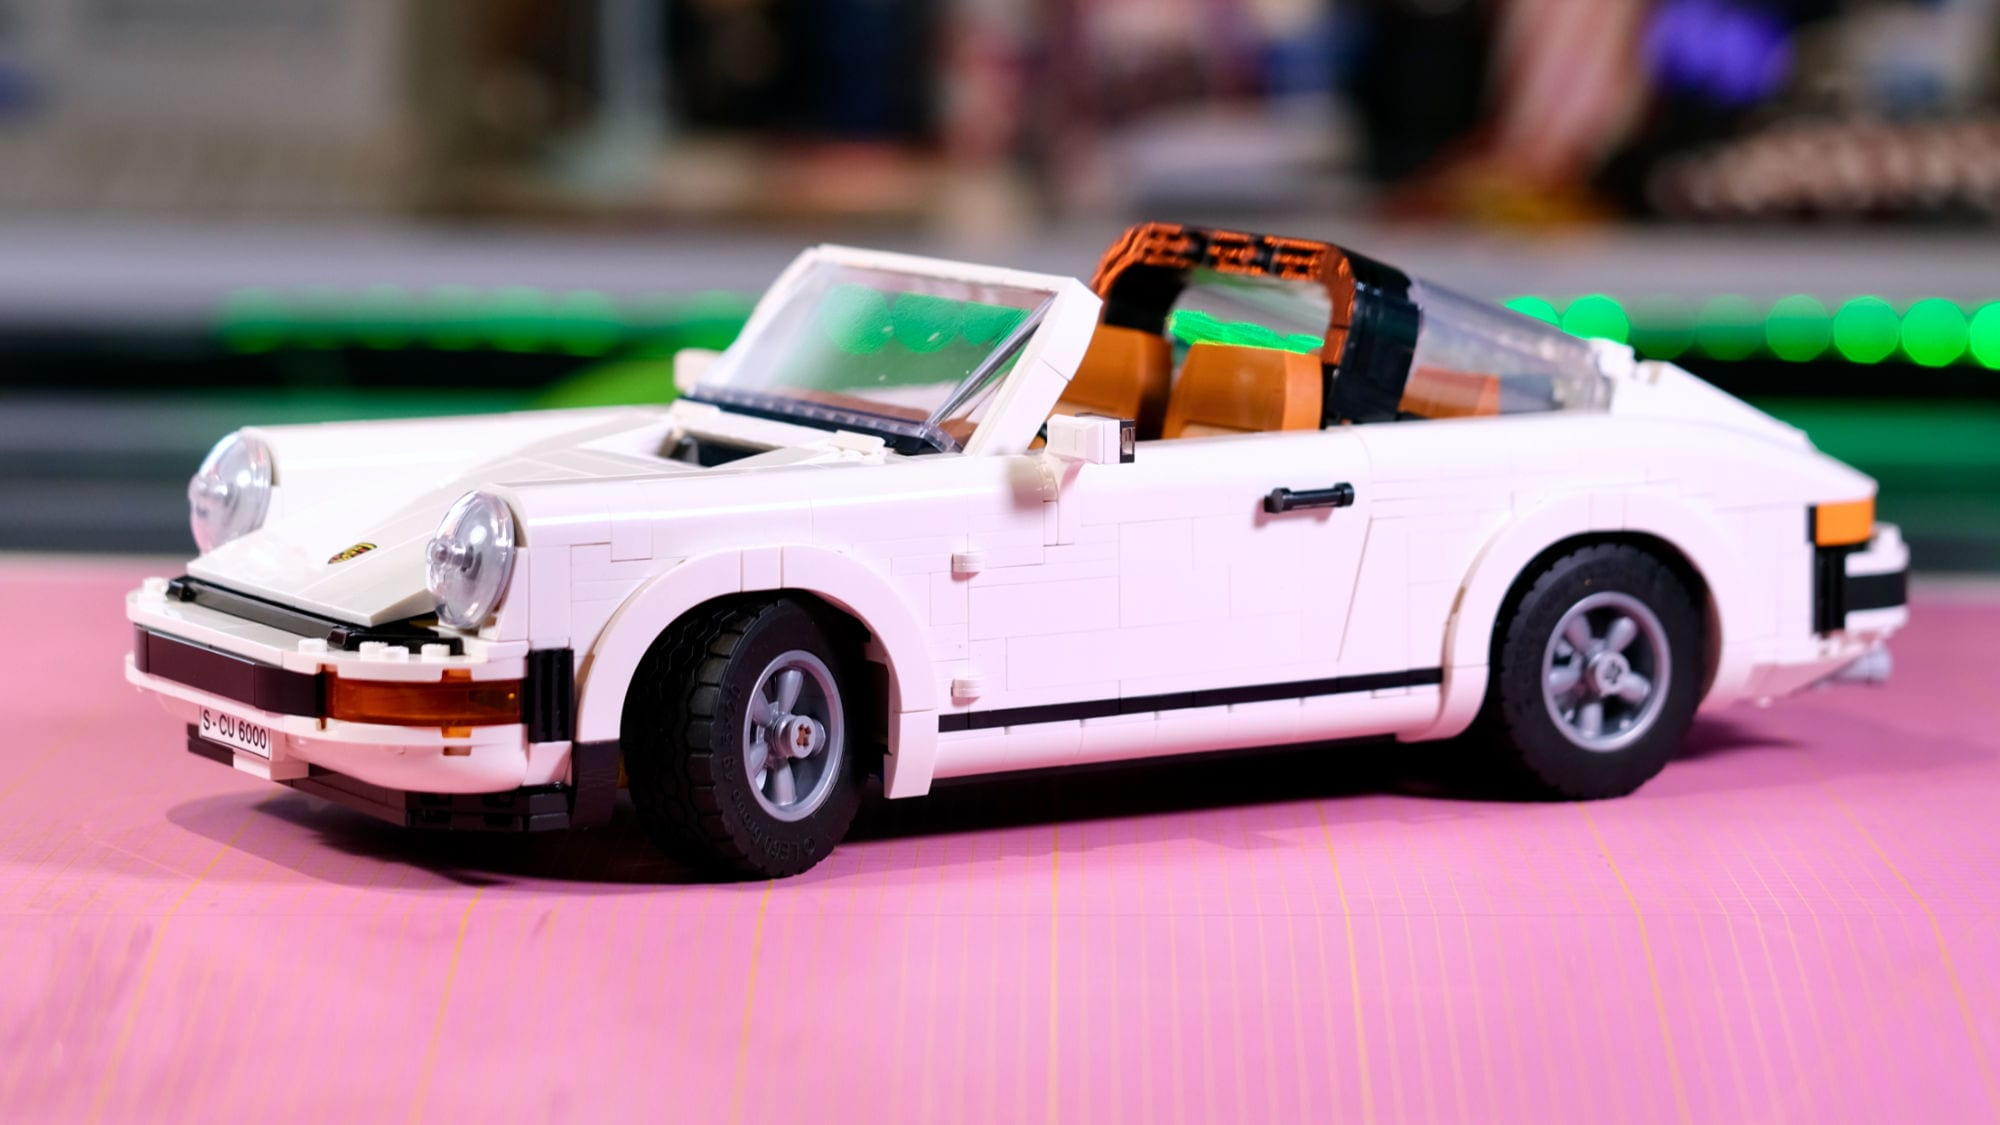 LEGO Porsche 911, la recensione